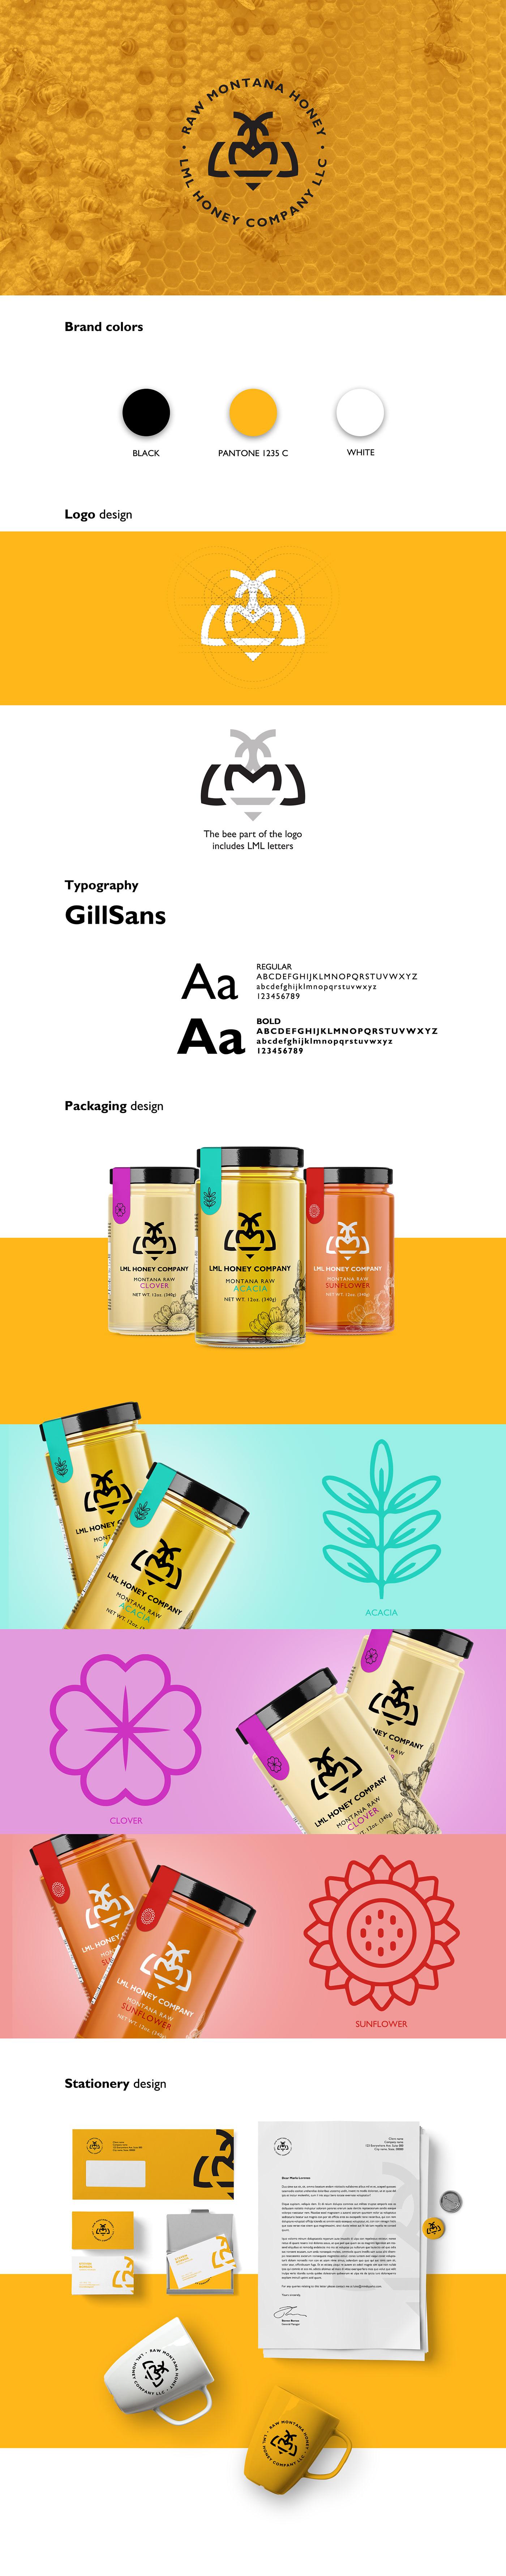 animation  bee brand design honey logo Logomotion motiondesign package yellow